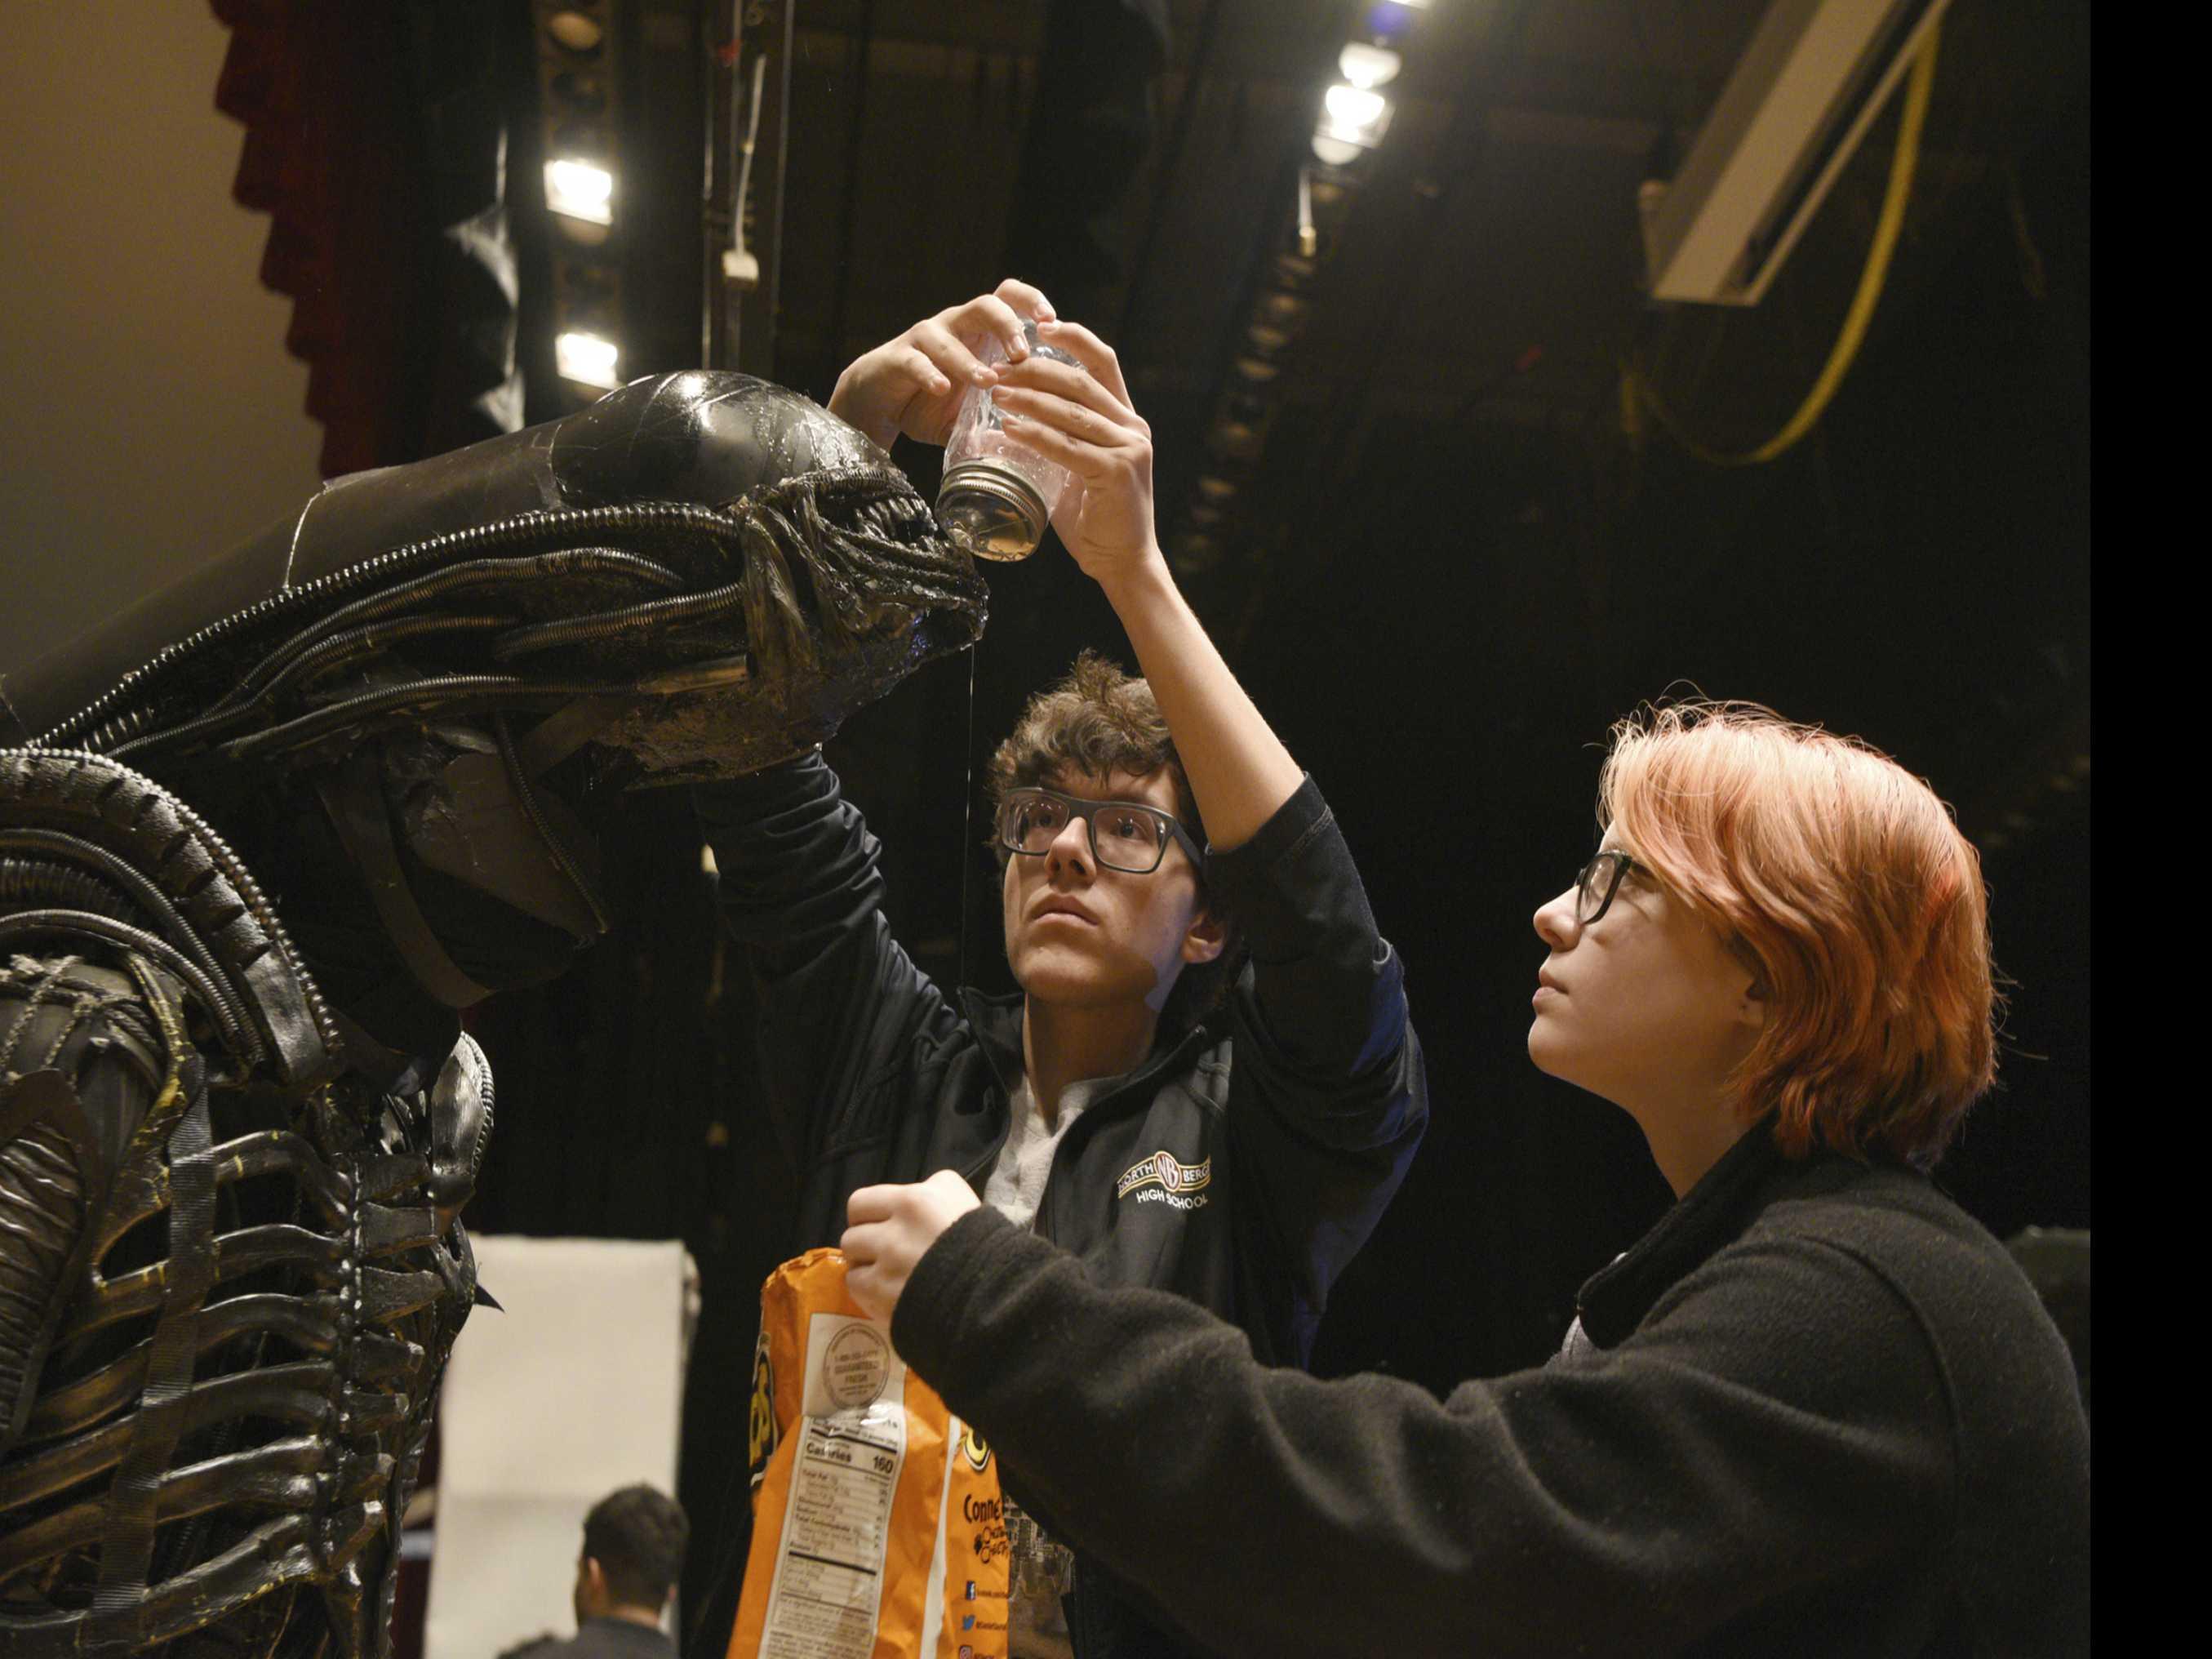 Sigourney Weaver Helps School Celebrate 'Alien' Production